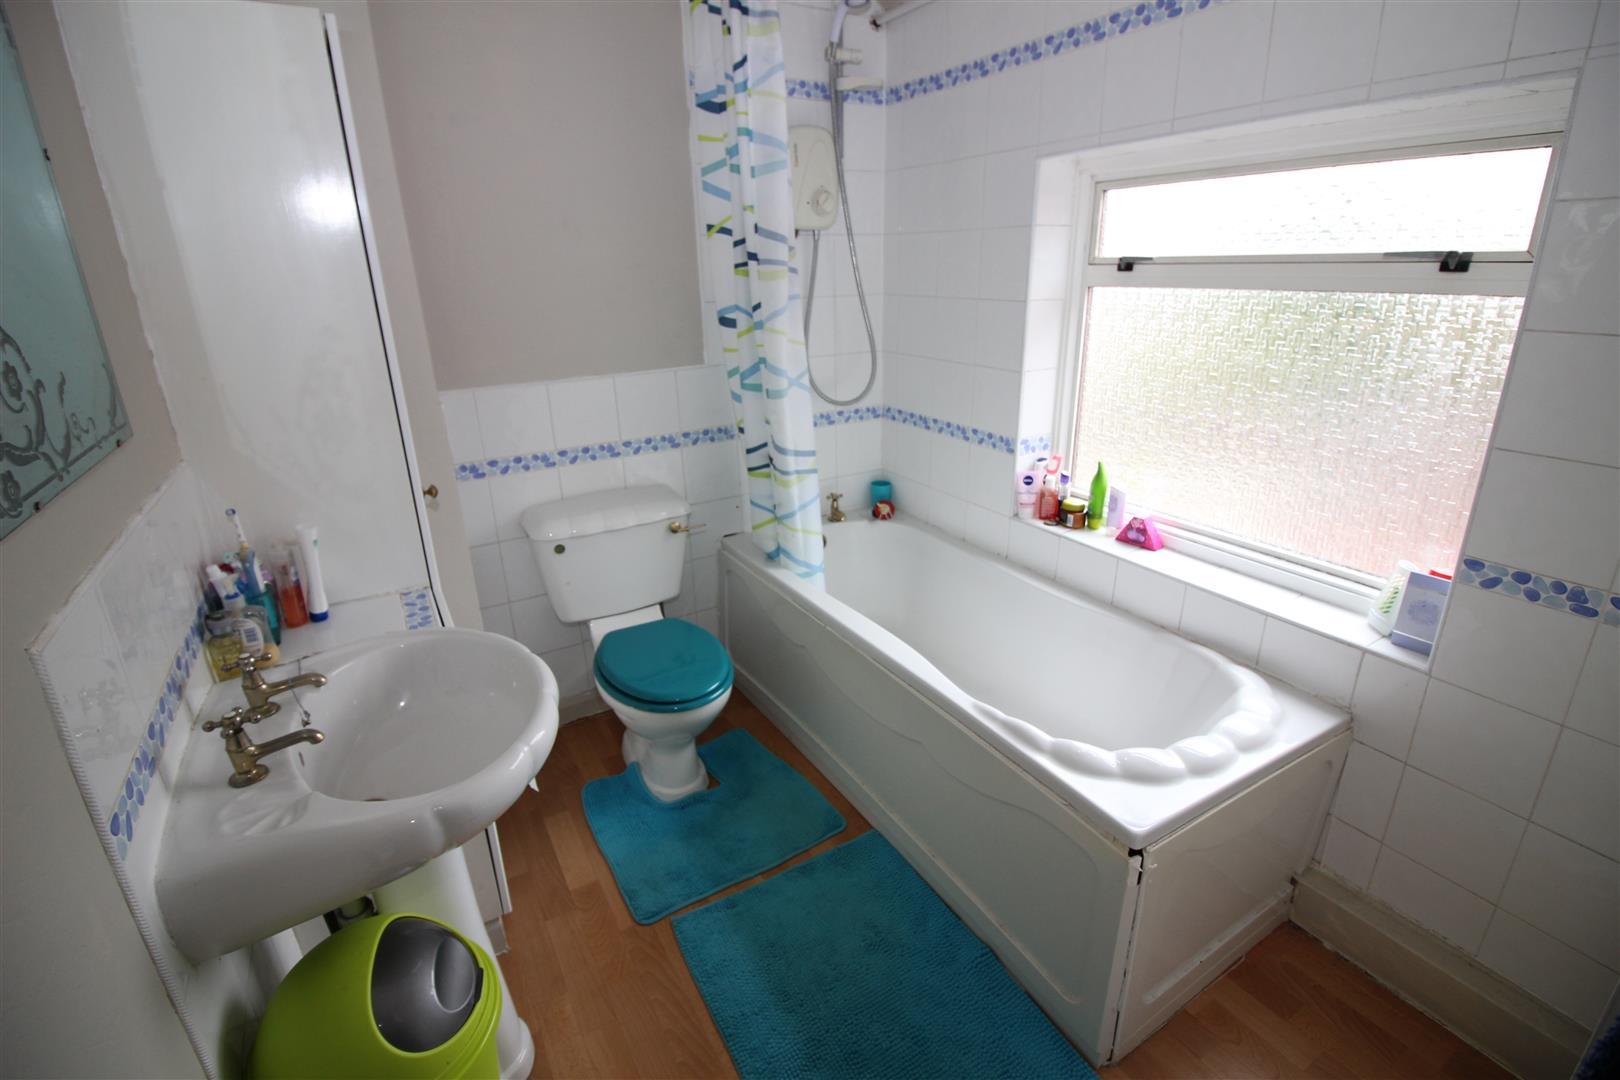 Property to buy in balfour road stapleford robert ellis for Bathroom 3 piece suite